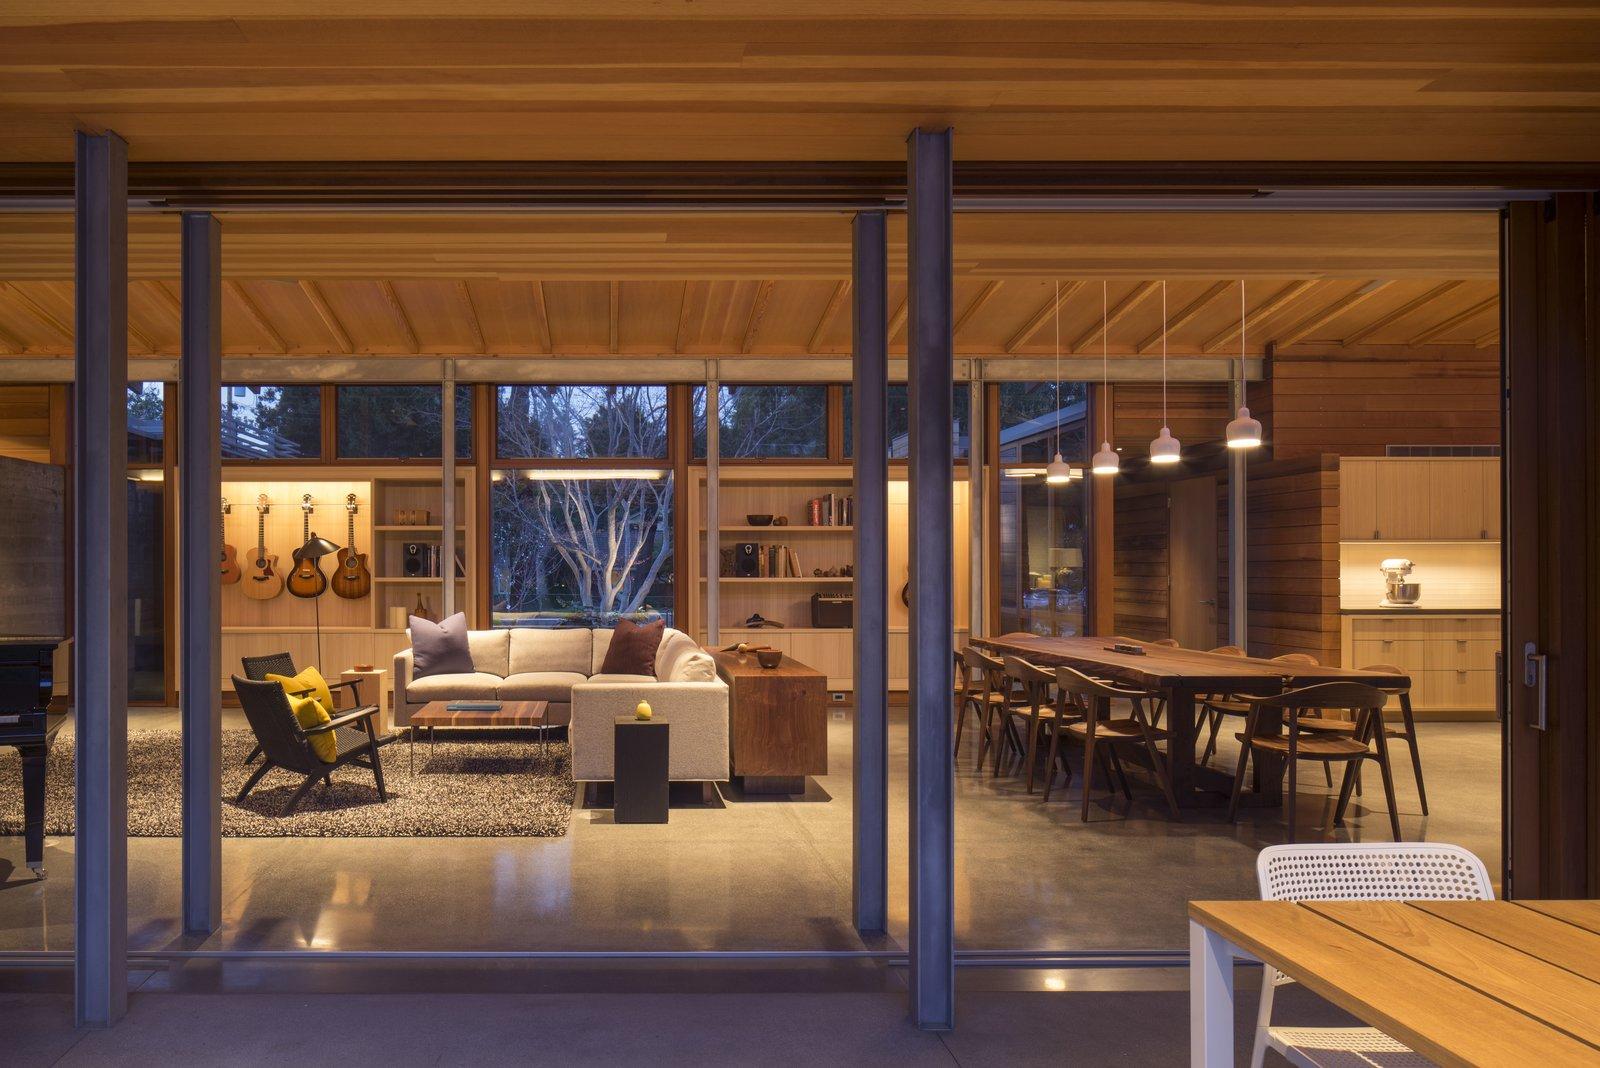 Living room from Los Altos Residence